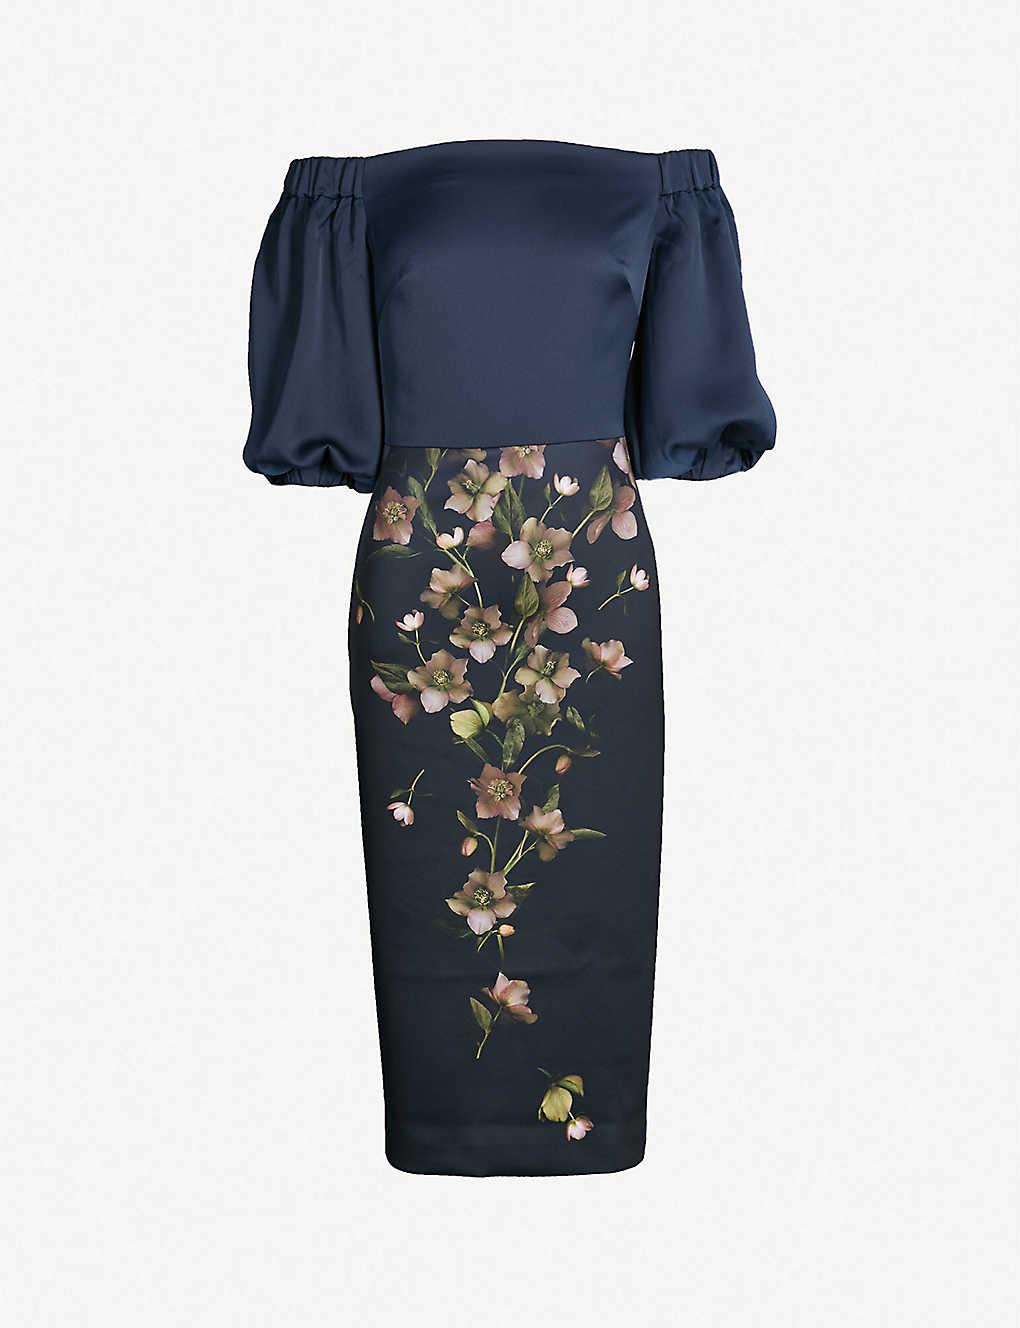 d17ed6d54 TED BAKER - Beaa floral printed satin pencil dress | Selfridges.com